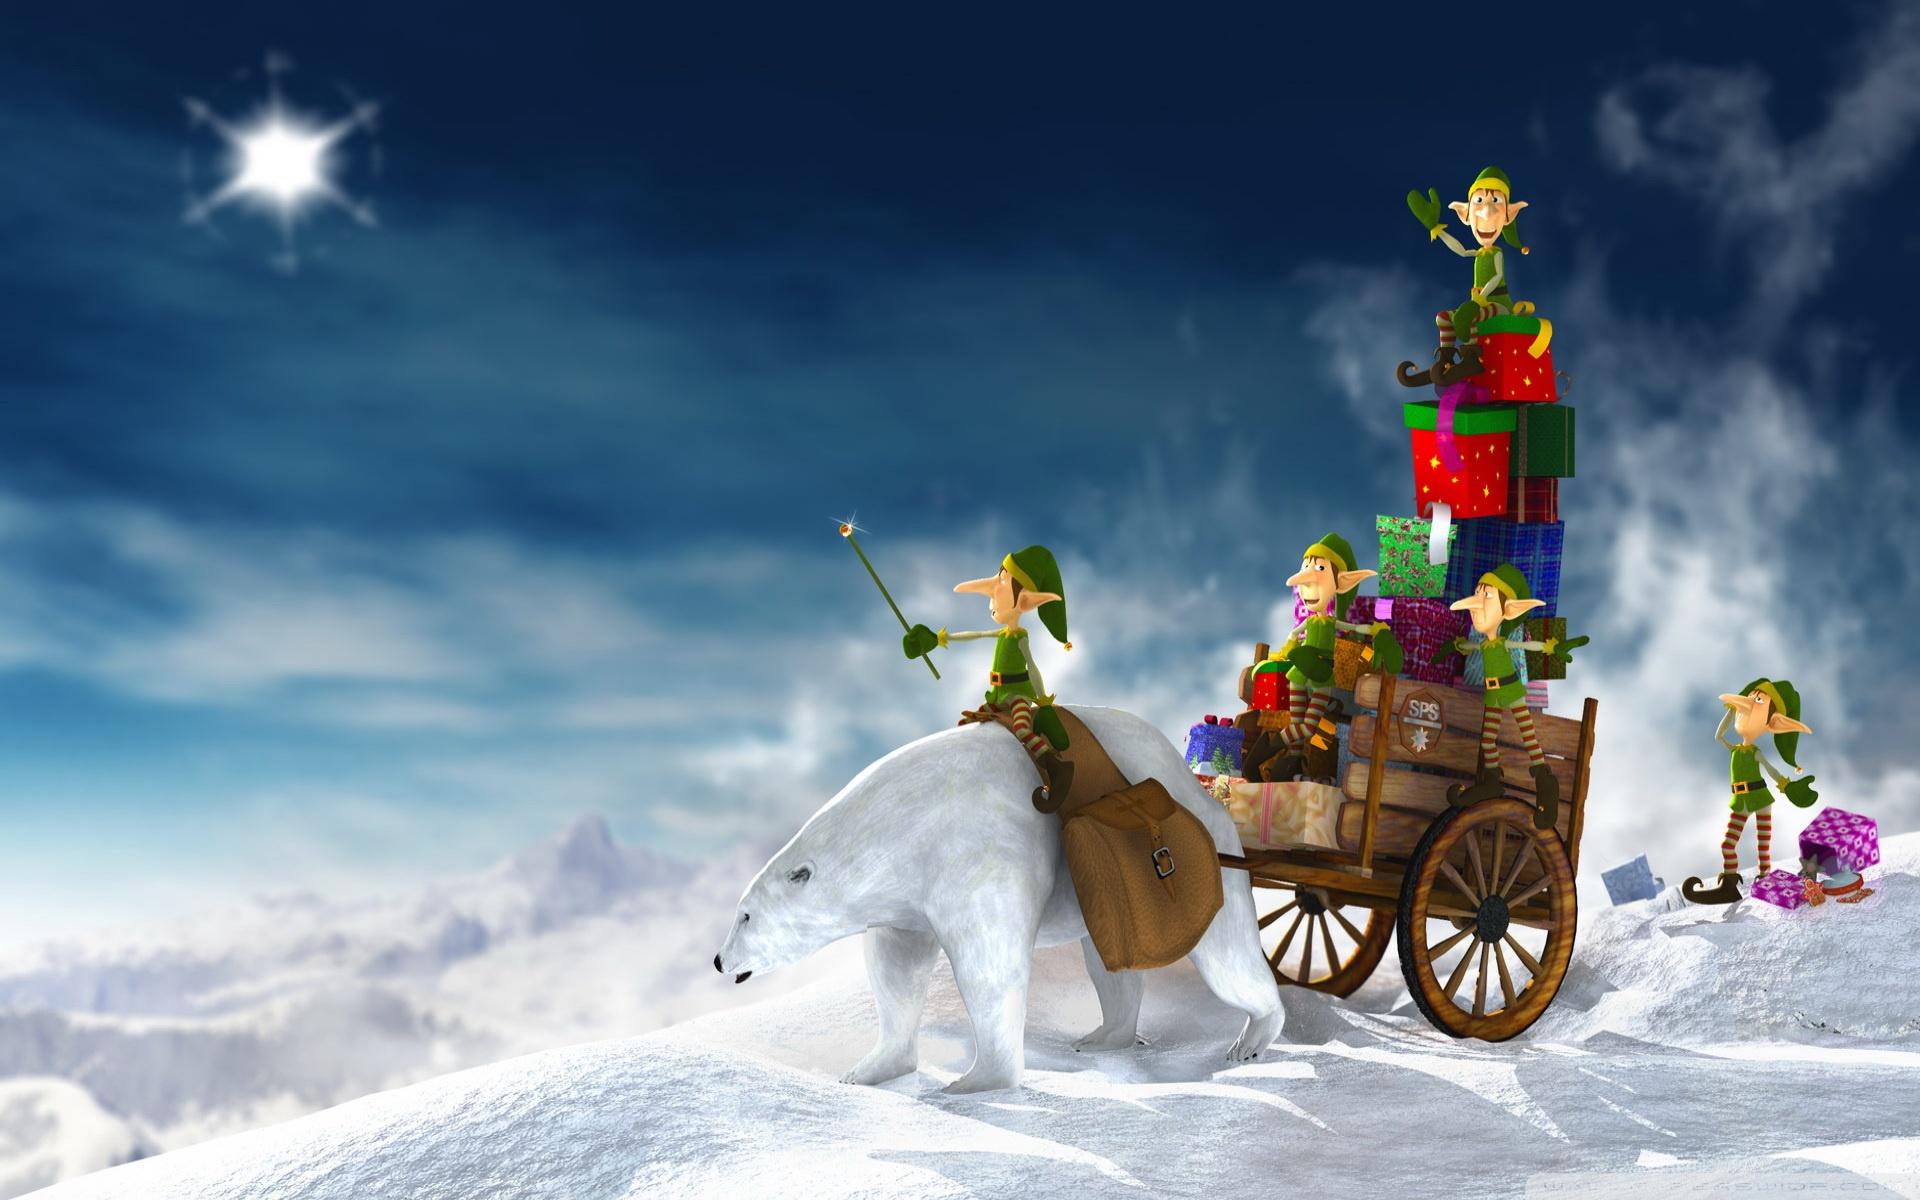 Christmas Elves 3D 4K HD Desktop Wallpaper for 4K Ultra HD TV 1920x1200